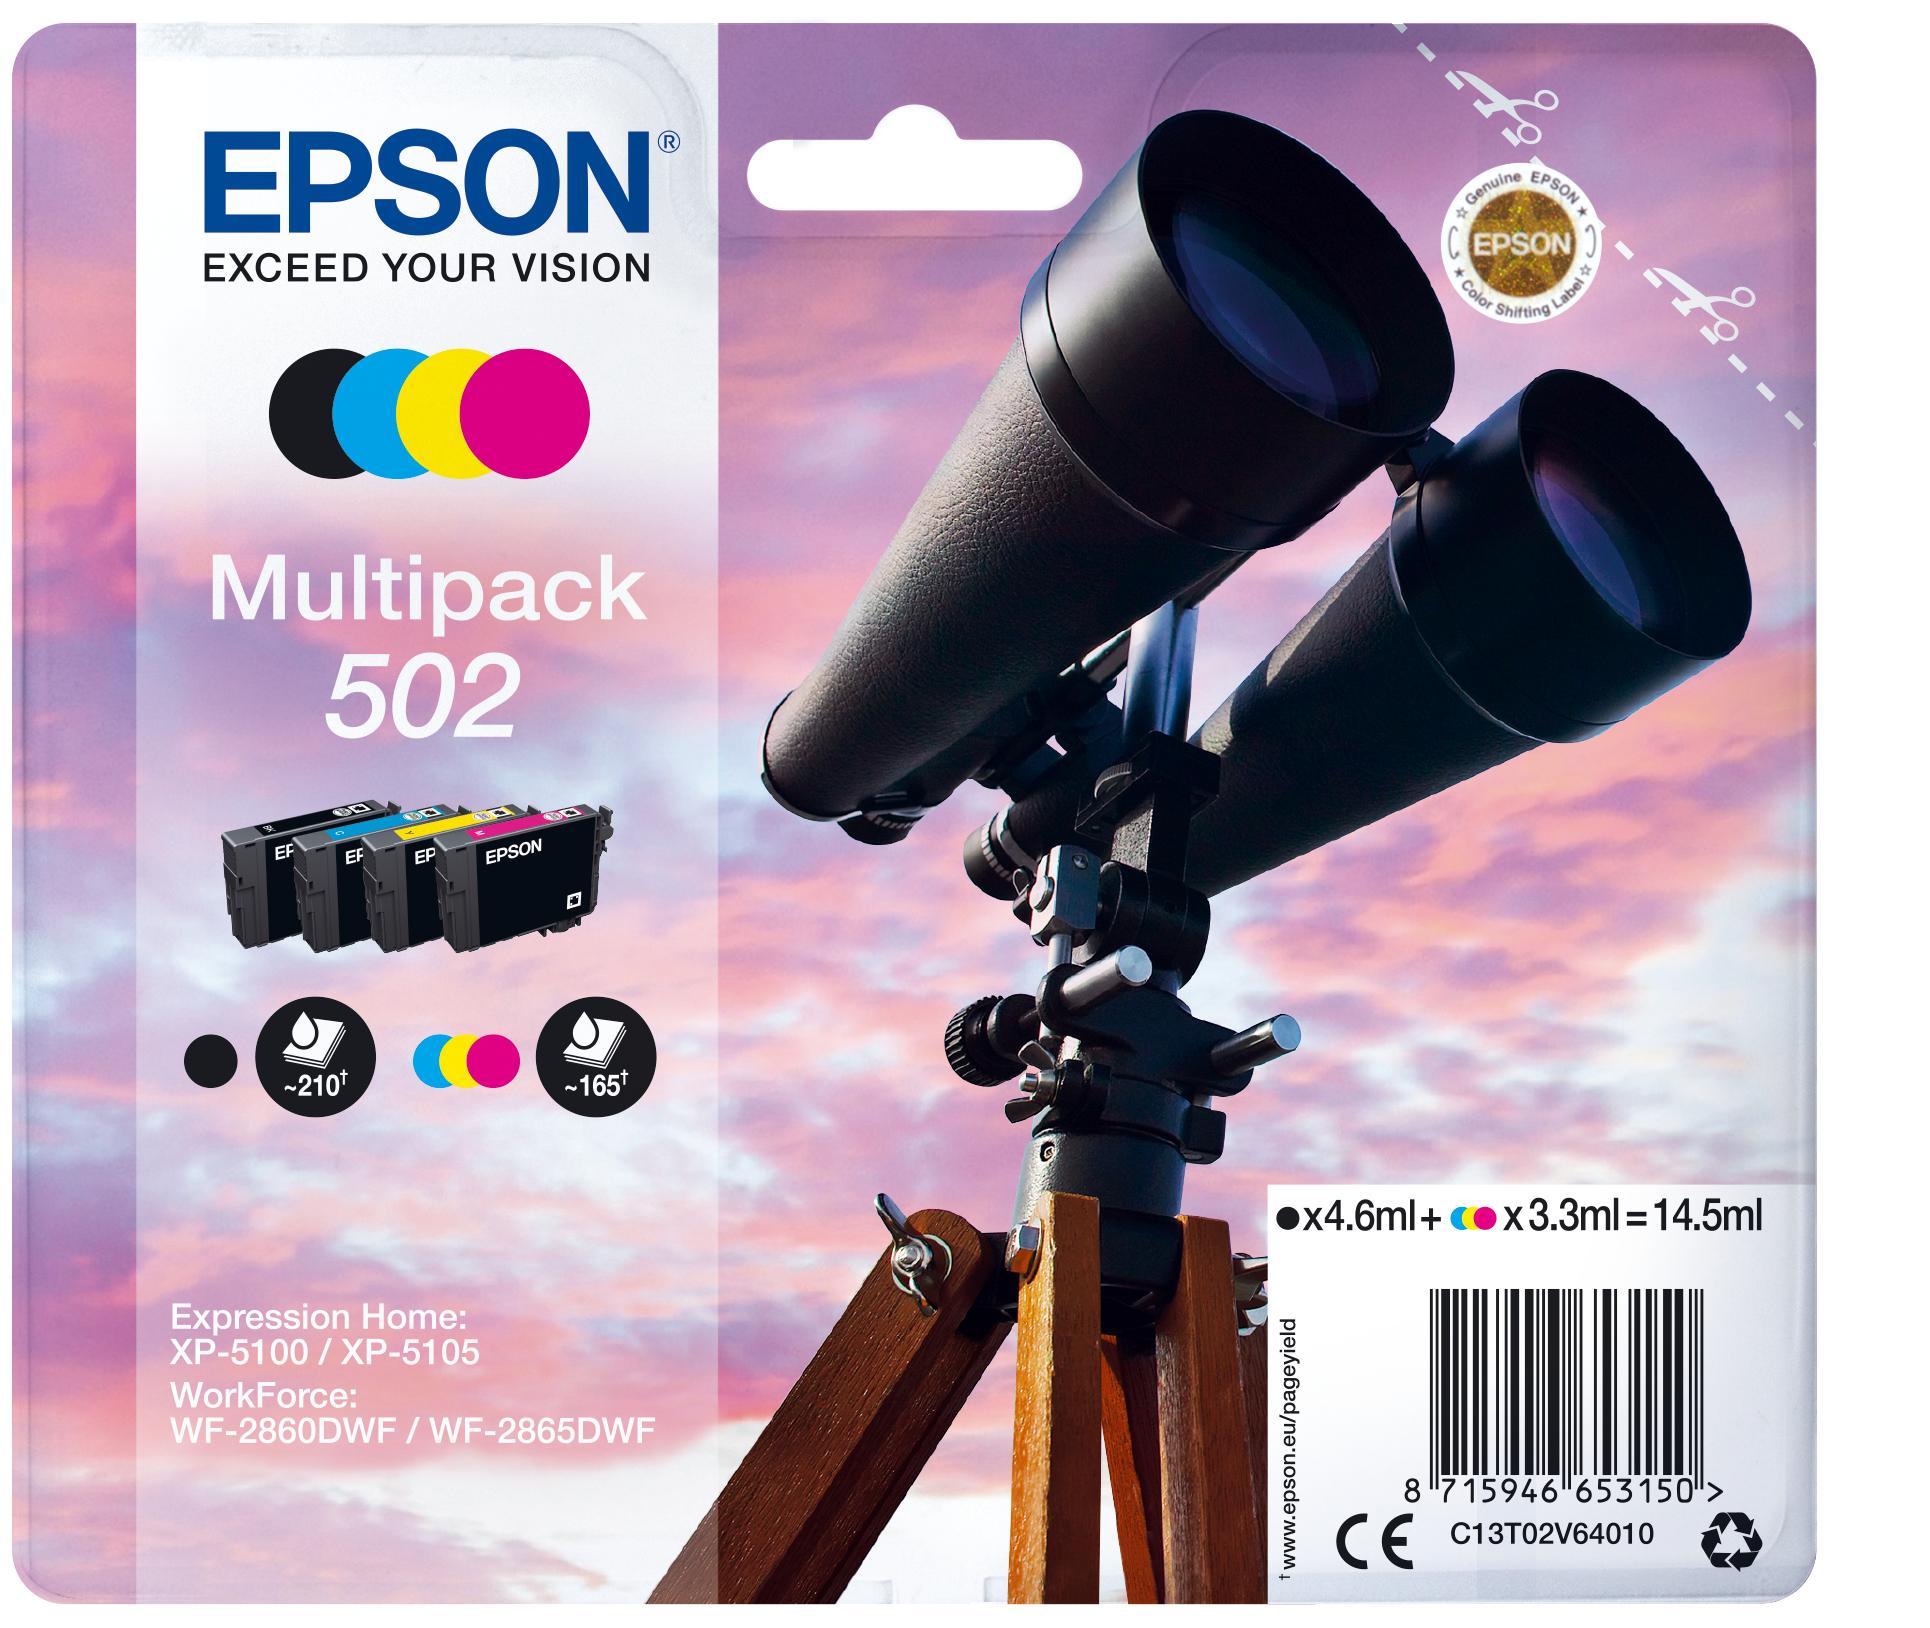 Epson C13T02V64010